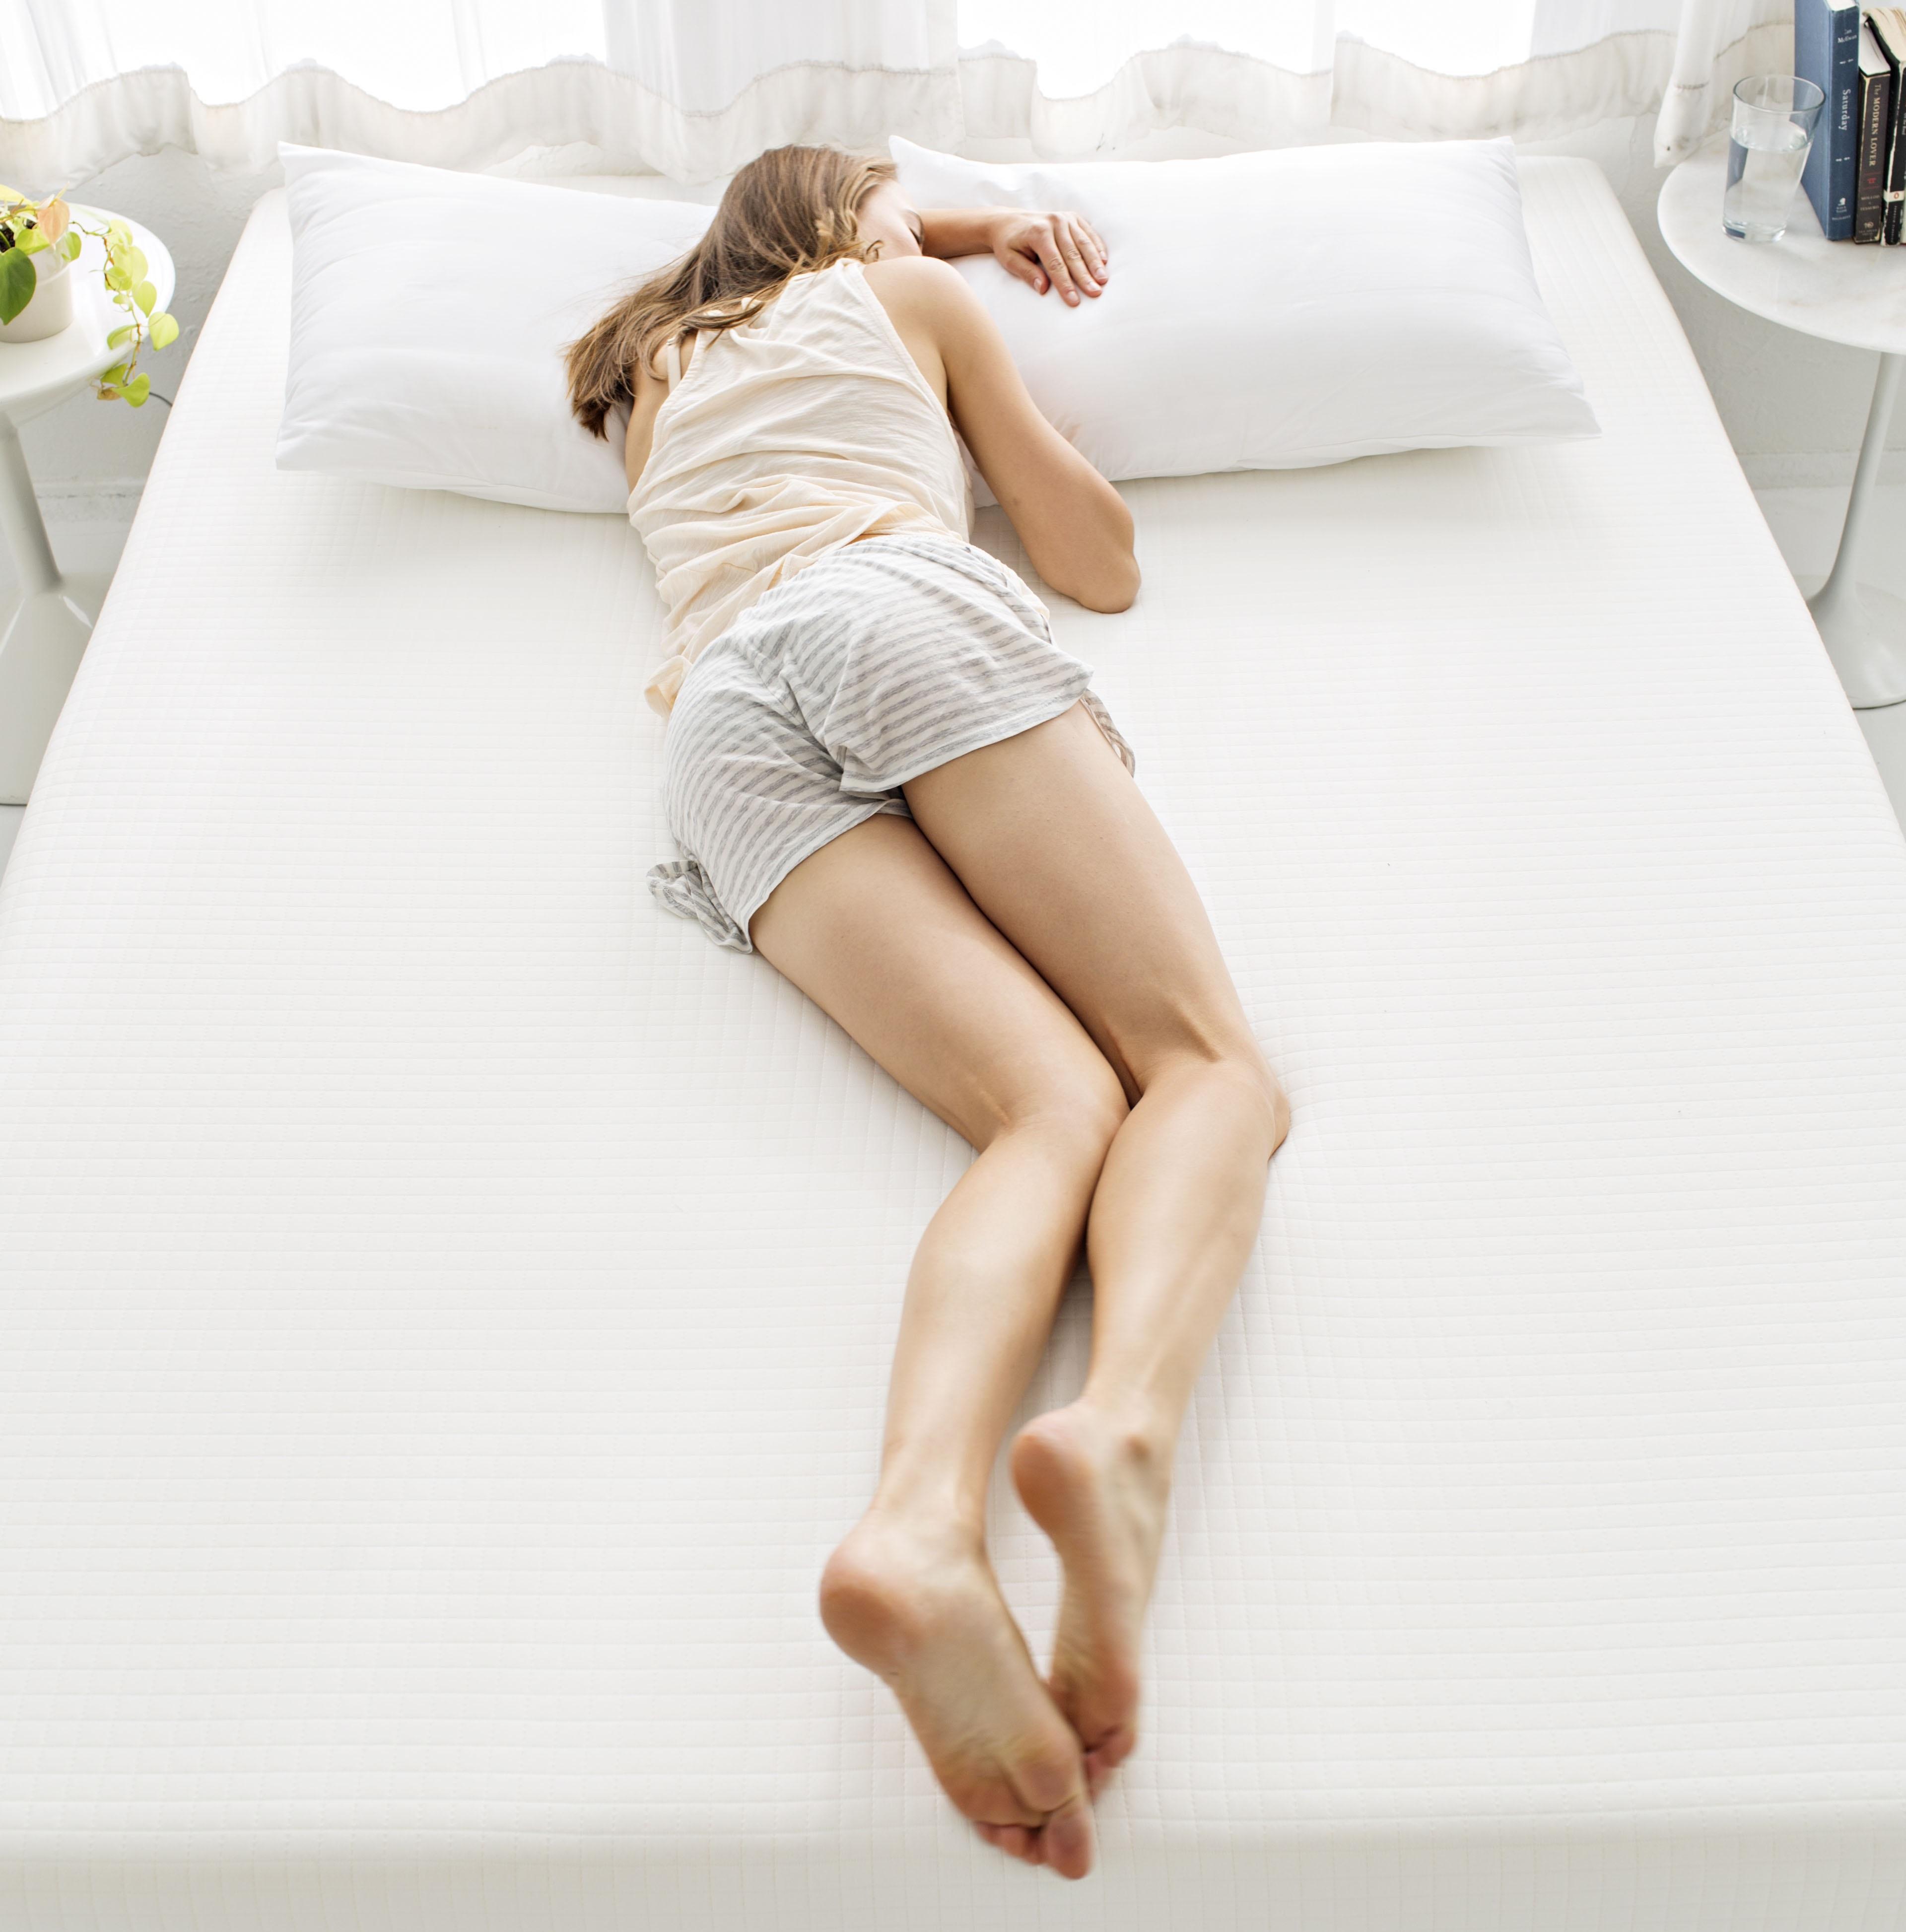 PunjabKesari, Freefall Position Image, Sleeping Position Image